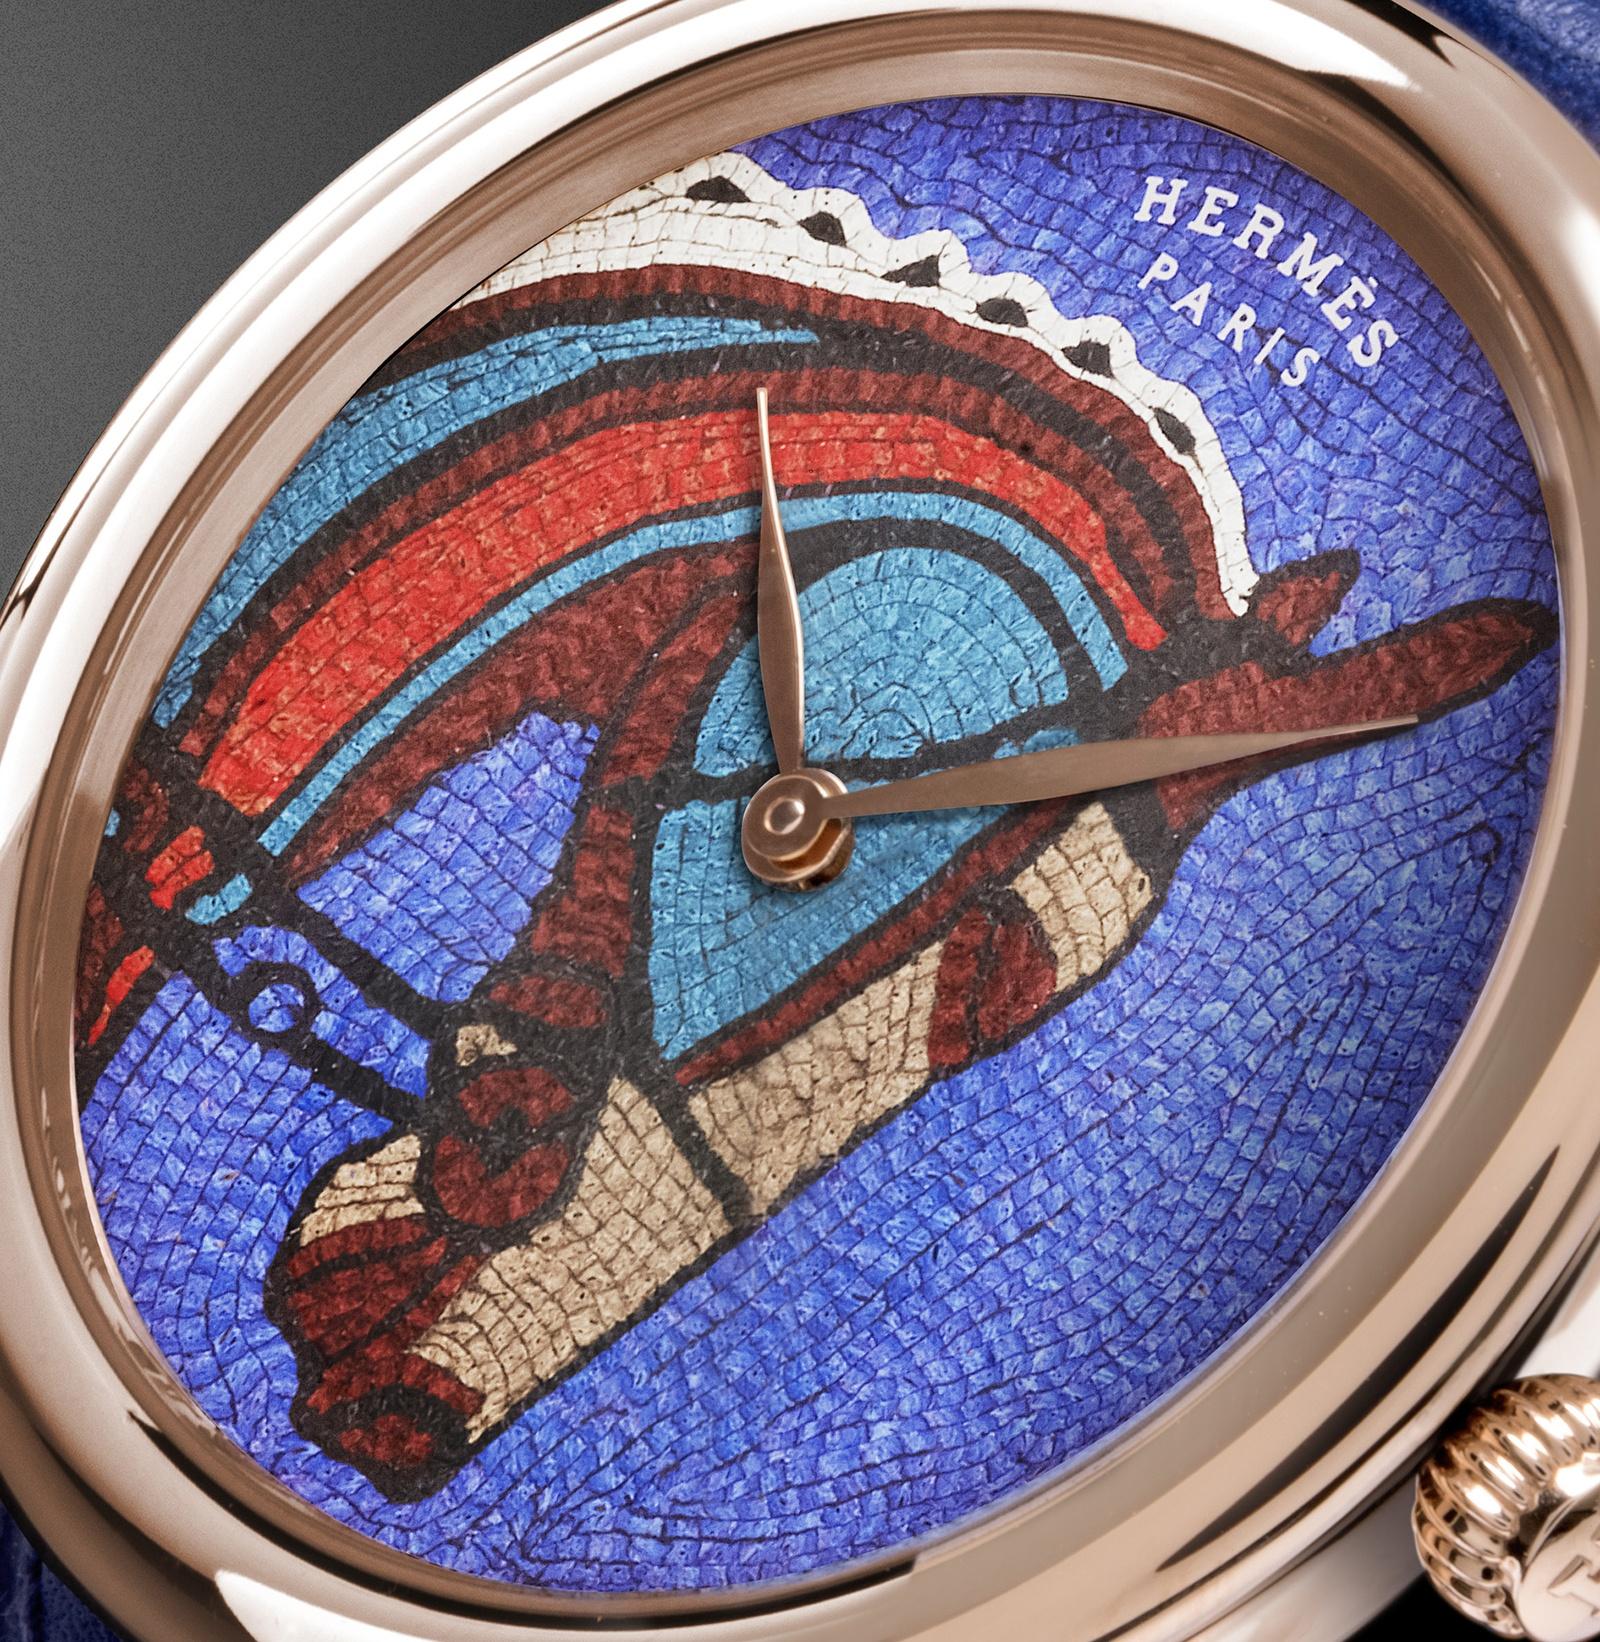 Hermes Arceau Robe du Soir dial